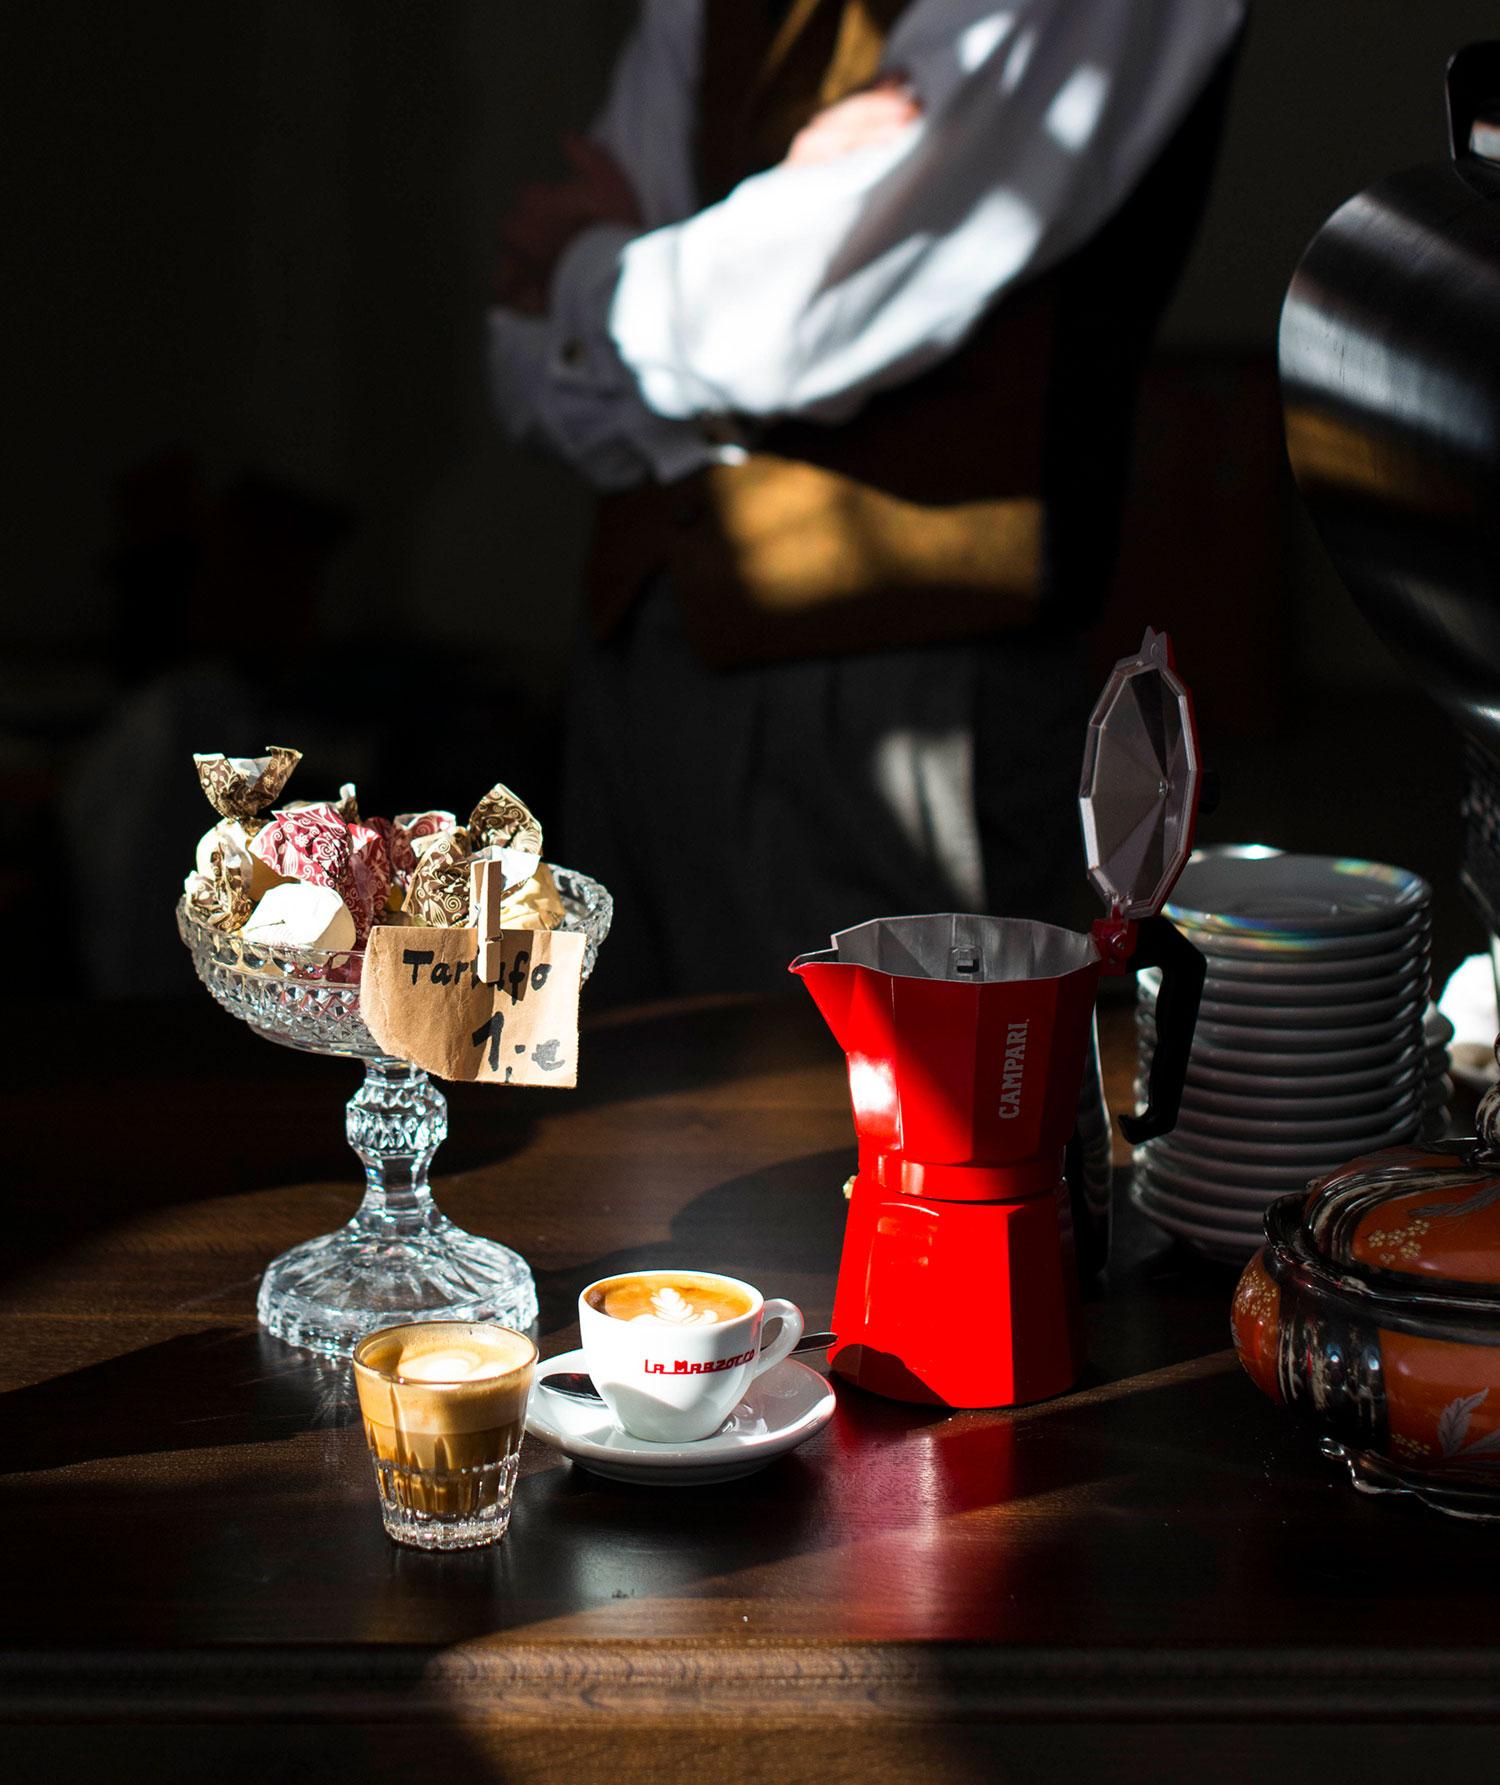 EspressoEspresso-Kaffee-6